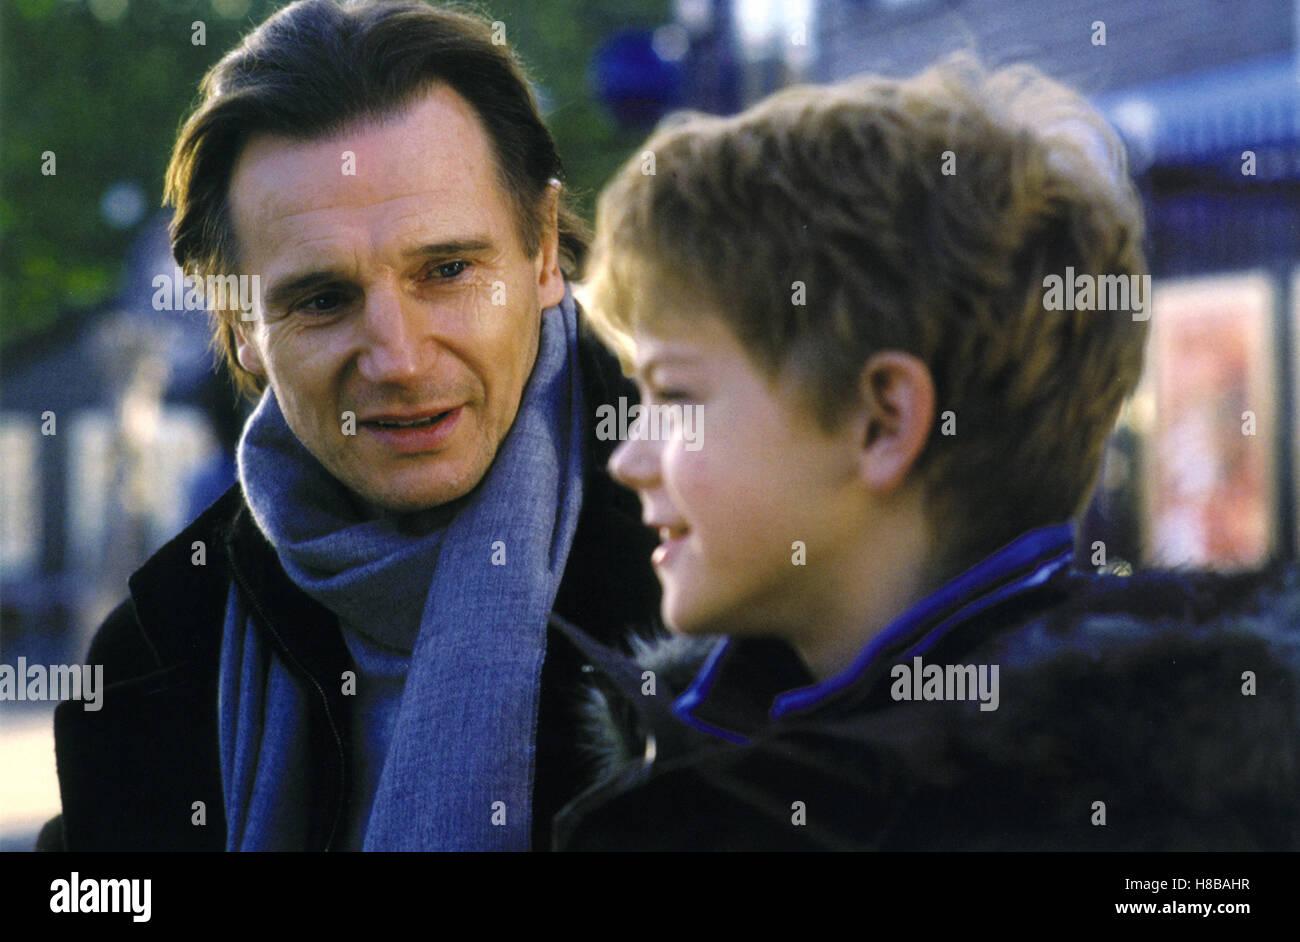 Tatsaechlich...Liebe, (LOVE ACTUALLY) GB 2003, Regie: Richard Curtis, LIAM NEESON, THOMAS SANGSTER, - Stock Image